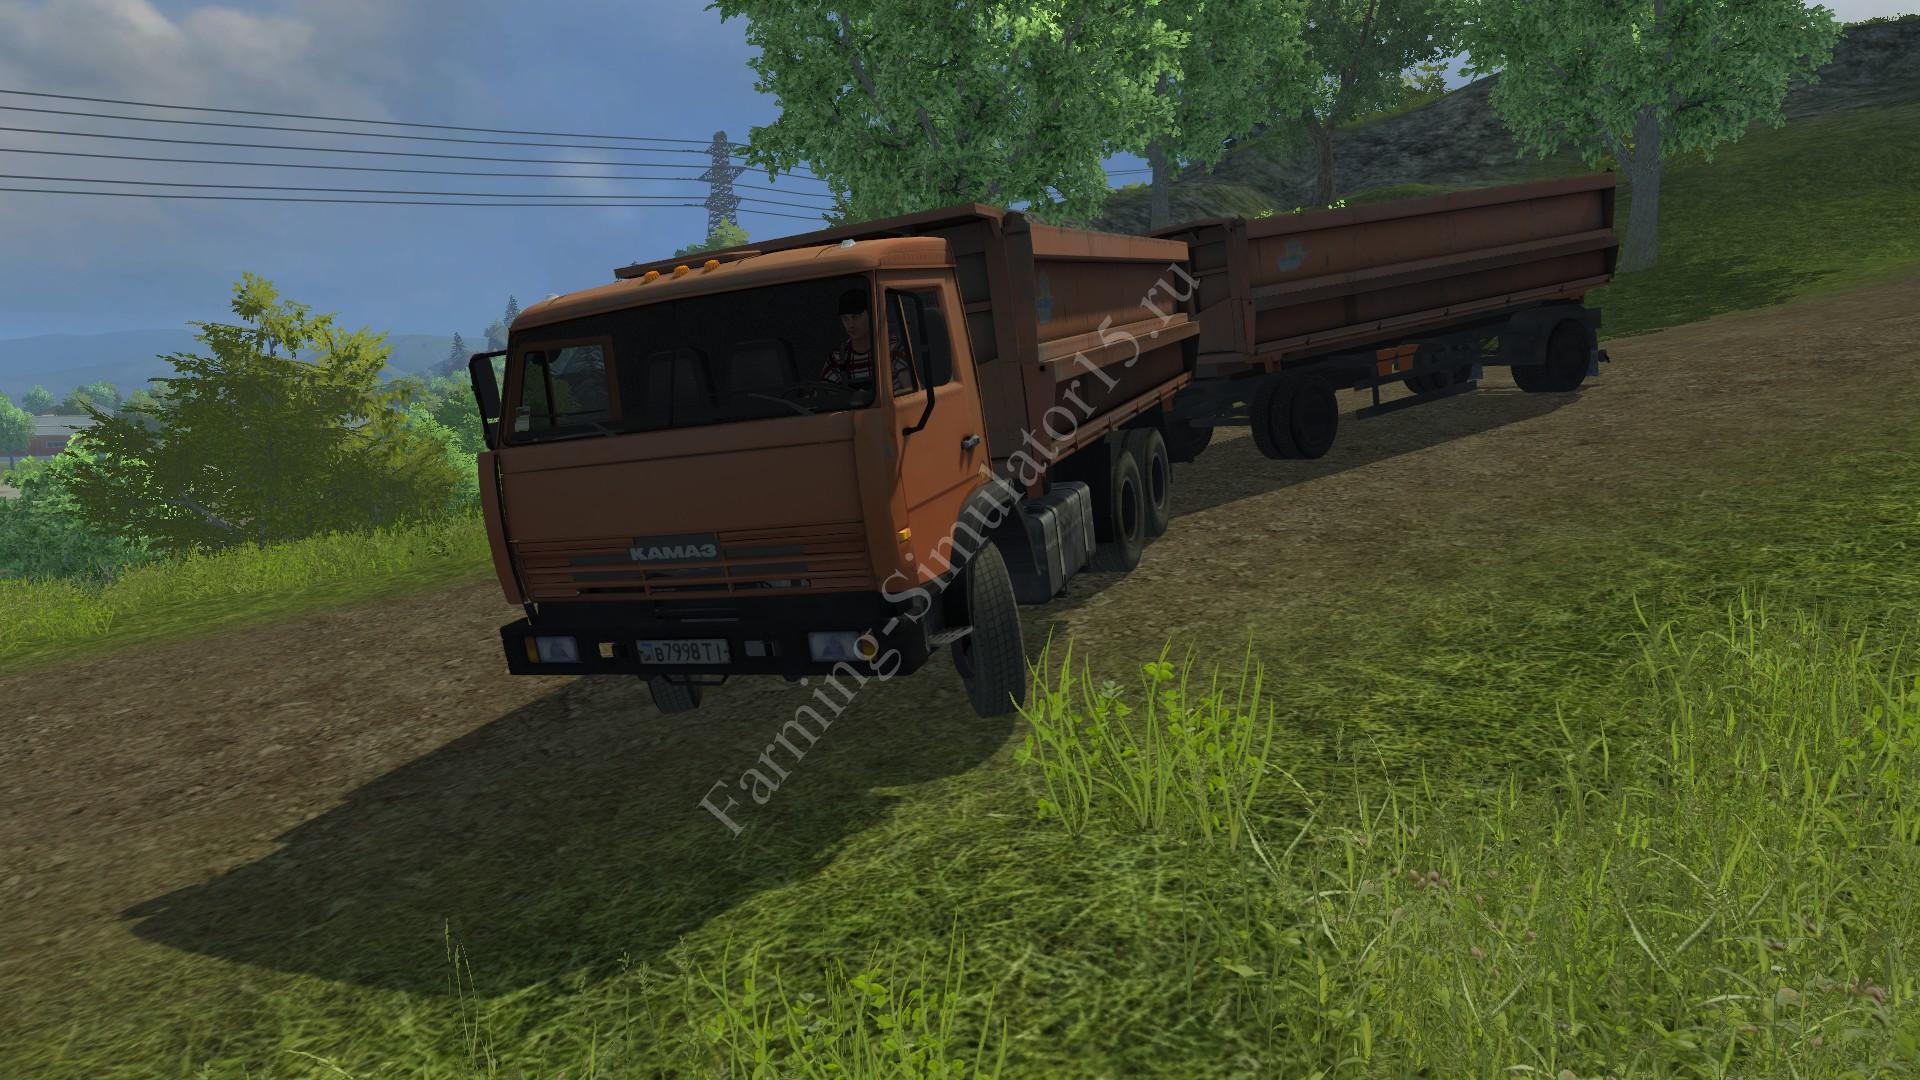 Мод грузовика KamAZ 45280 & trailer Nefaz v 1.0 Farming Simulator 2013, Farming Simulator 13